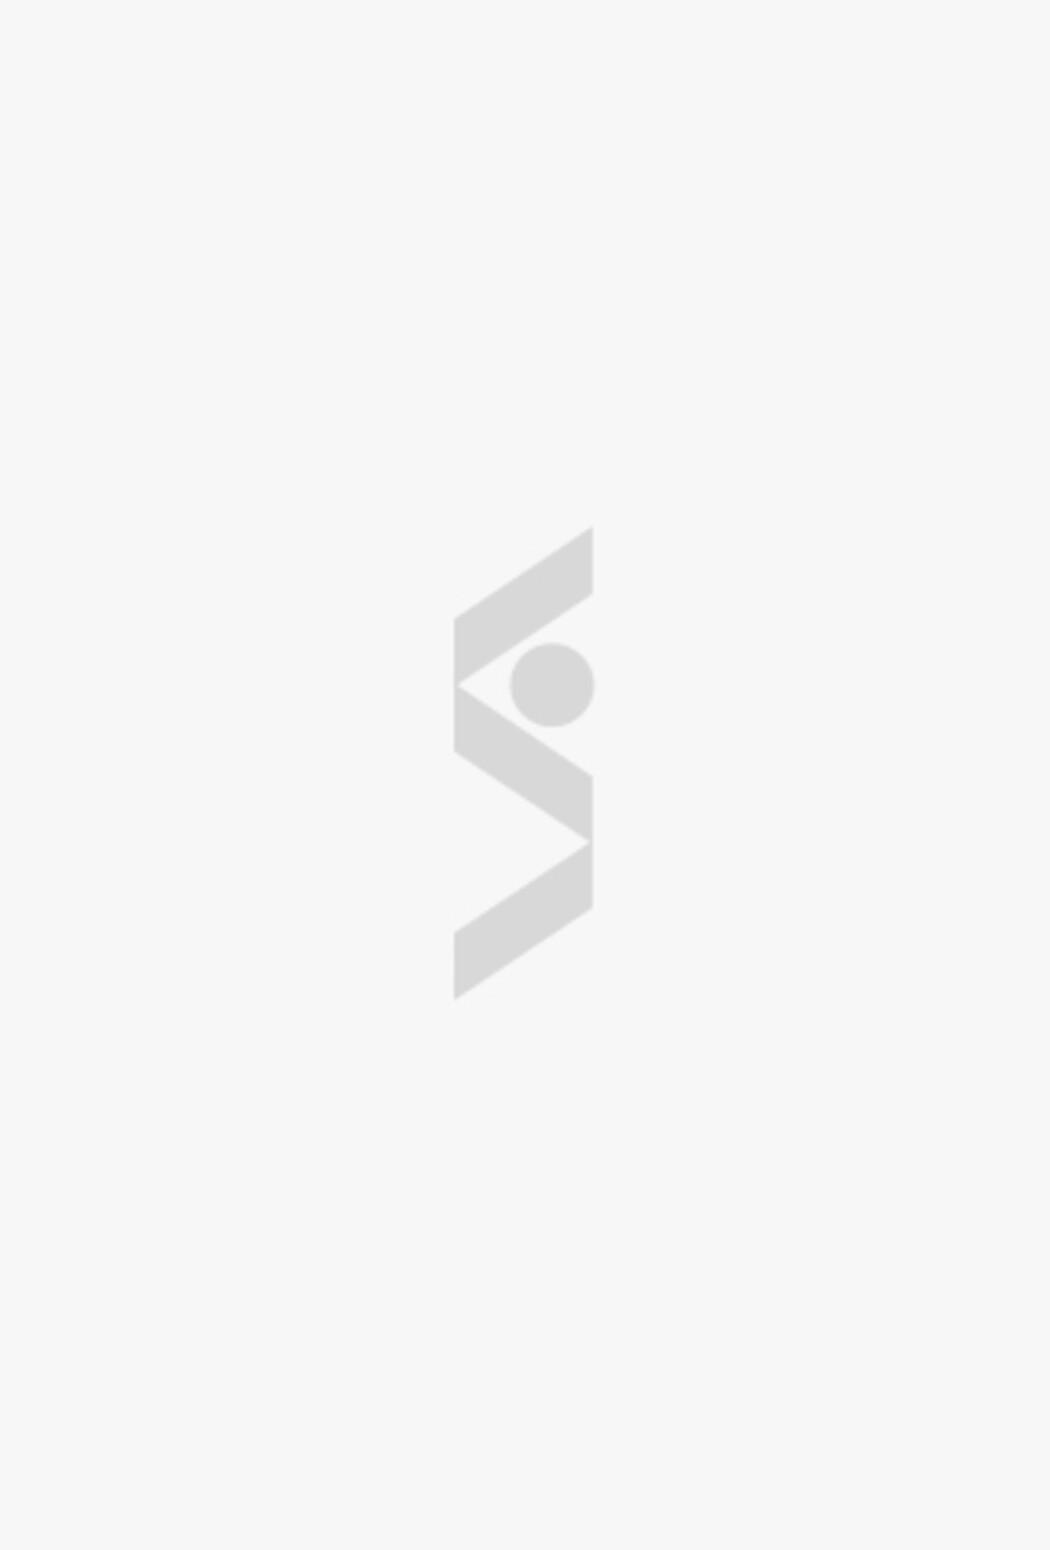 Парфюмерная вода feminite du bois Serge Lutens - скоро в продаже в интернет-магазине СТОКМАНН в Москве BAFC85AF-910D-4DEB-A33F-6FEB126D97E3